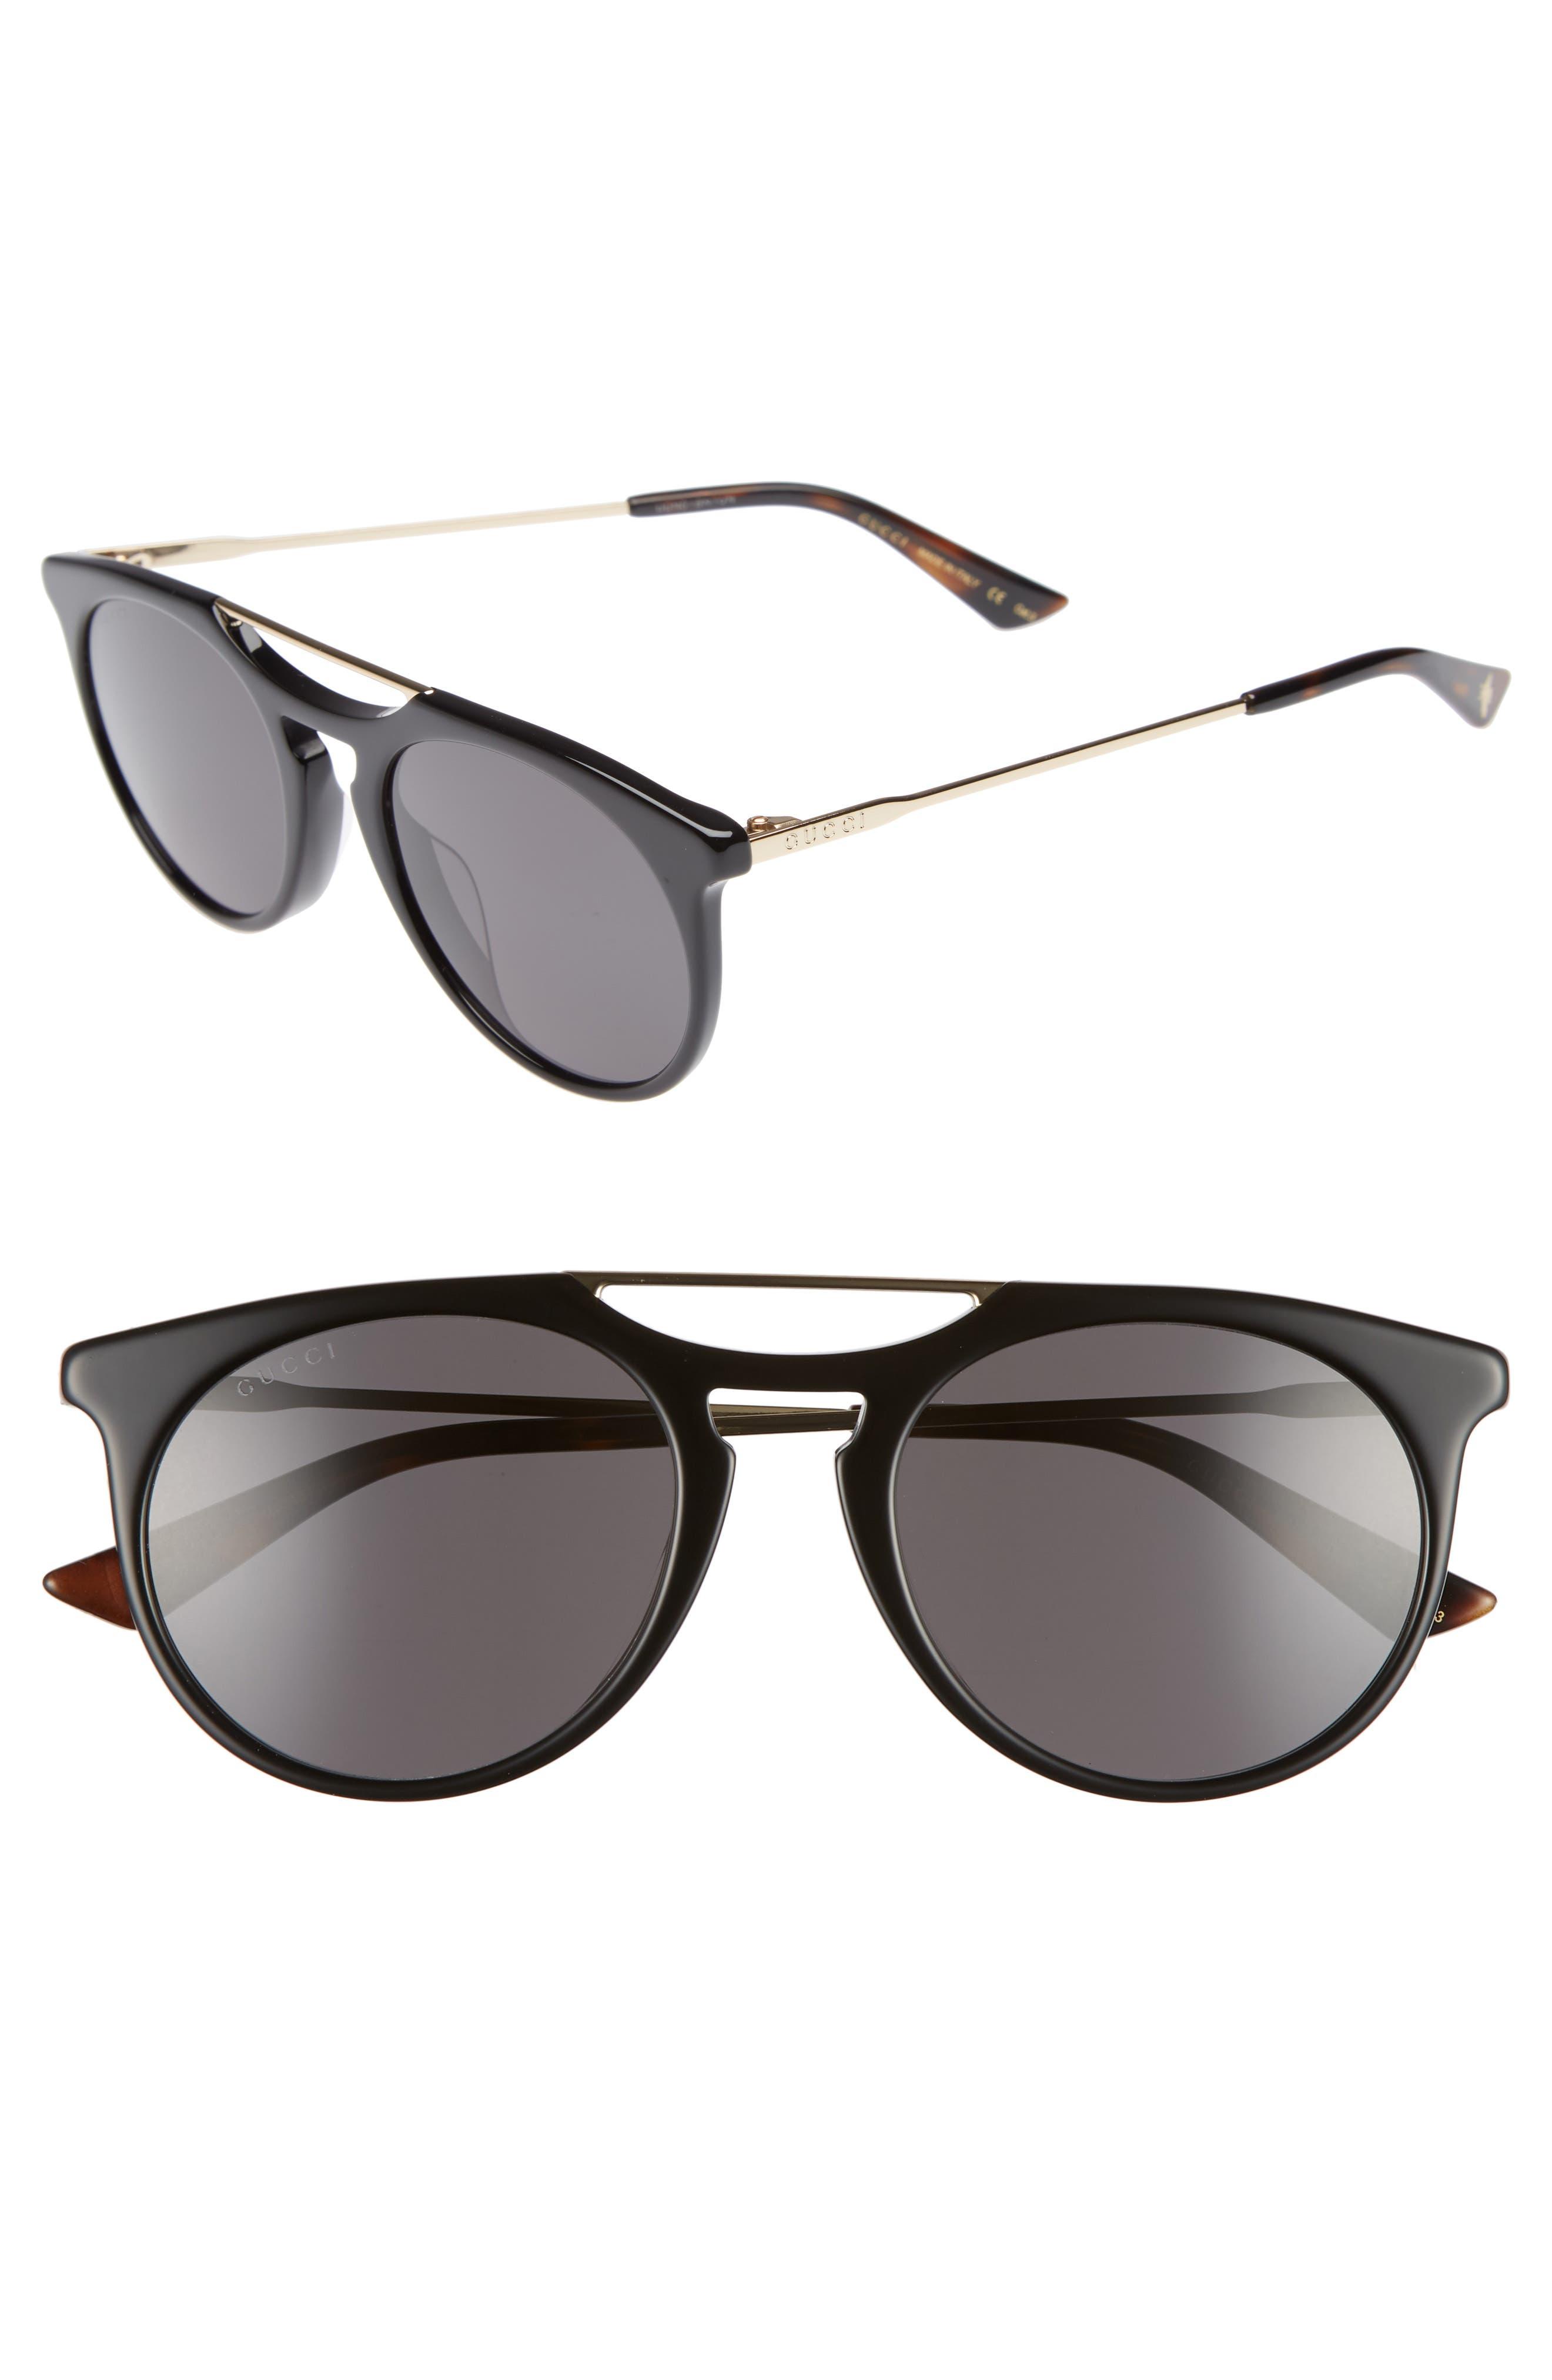 Light Combi 53mm Sunglasses,                         Main,                         color, Gold/ Dark Havana